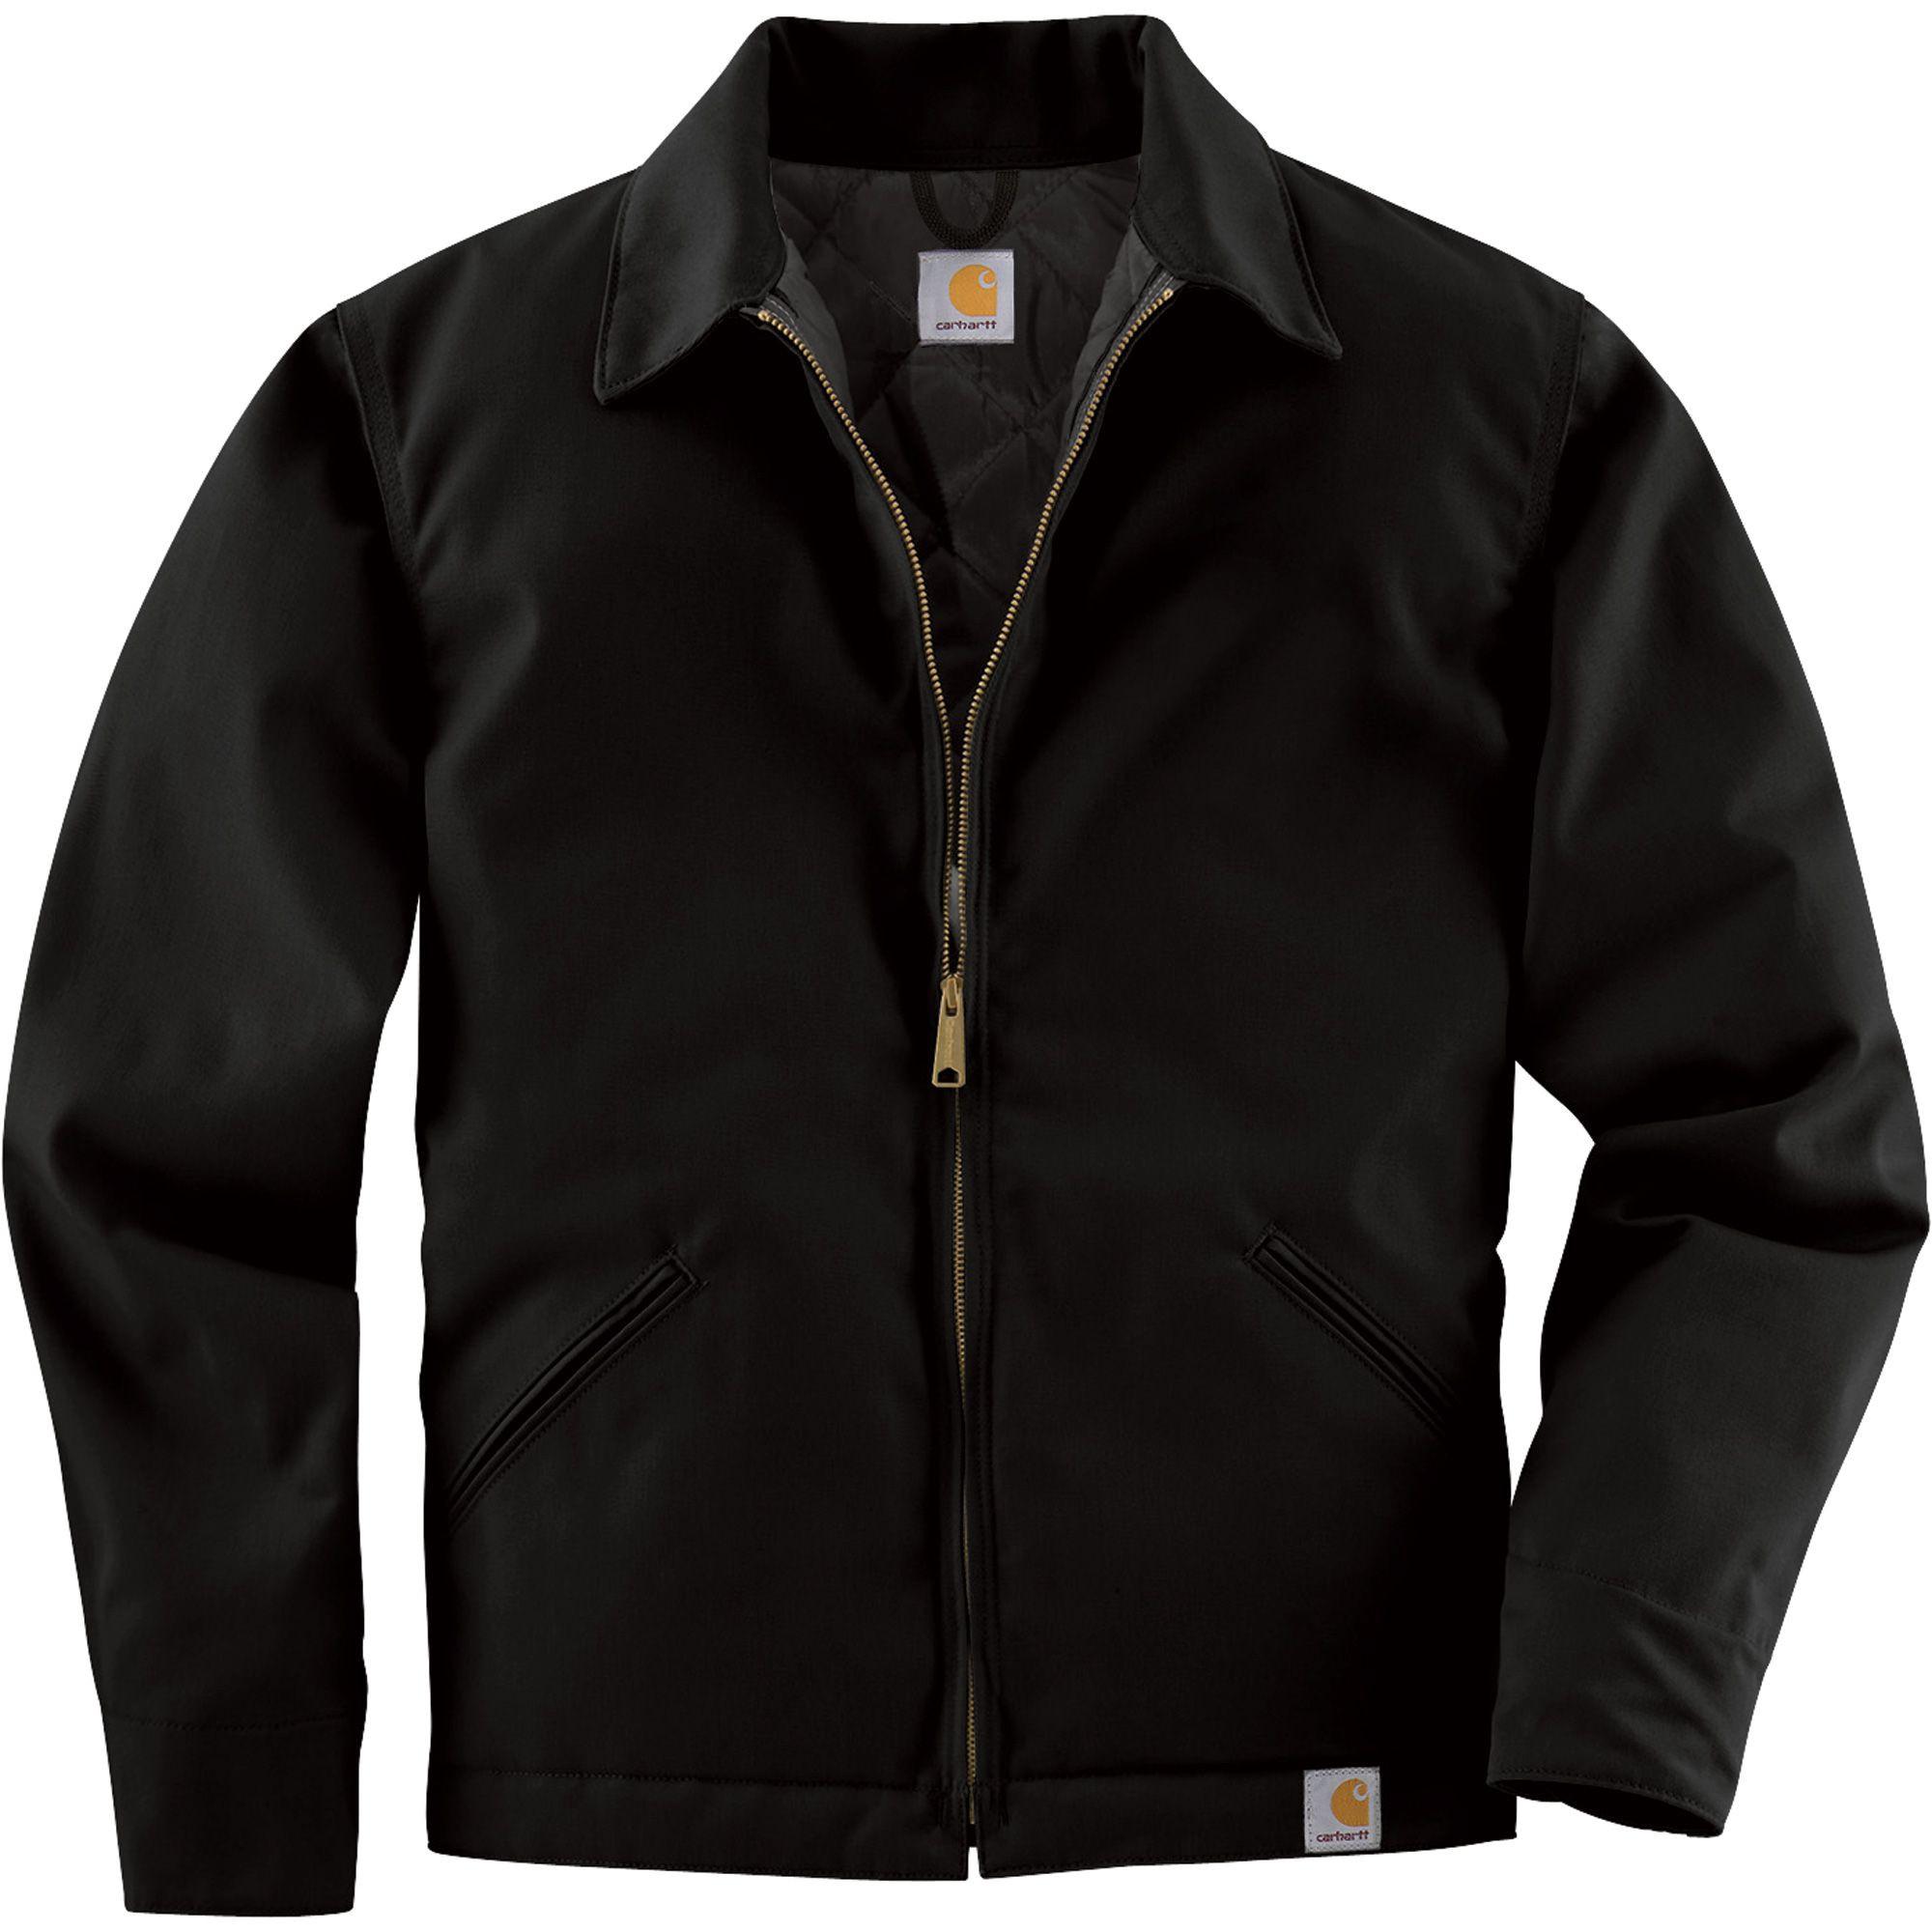 Куртка Carhartt Twill Work Jacket - J293 (Black, S)